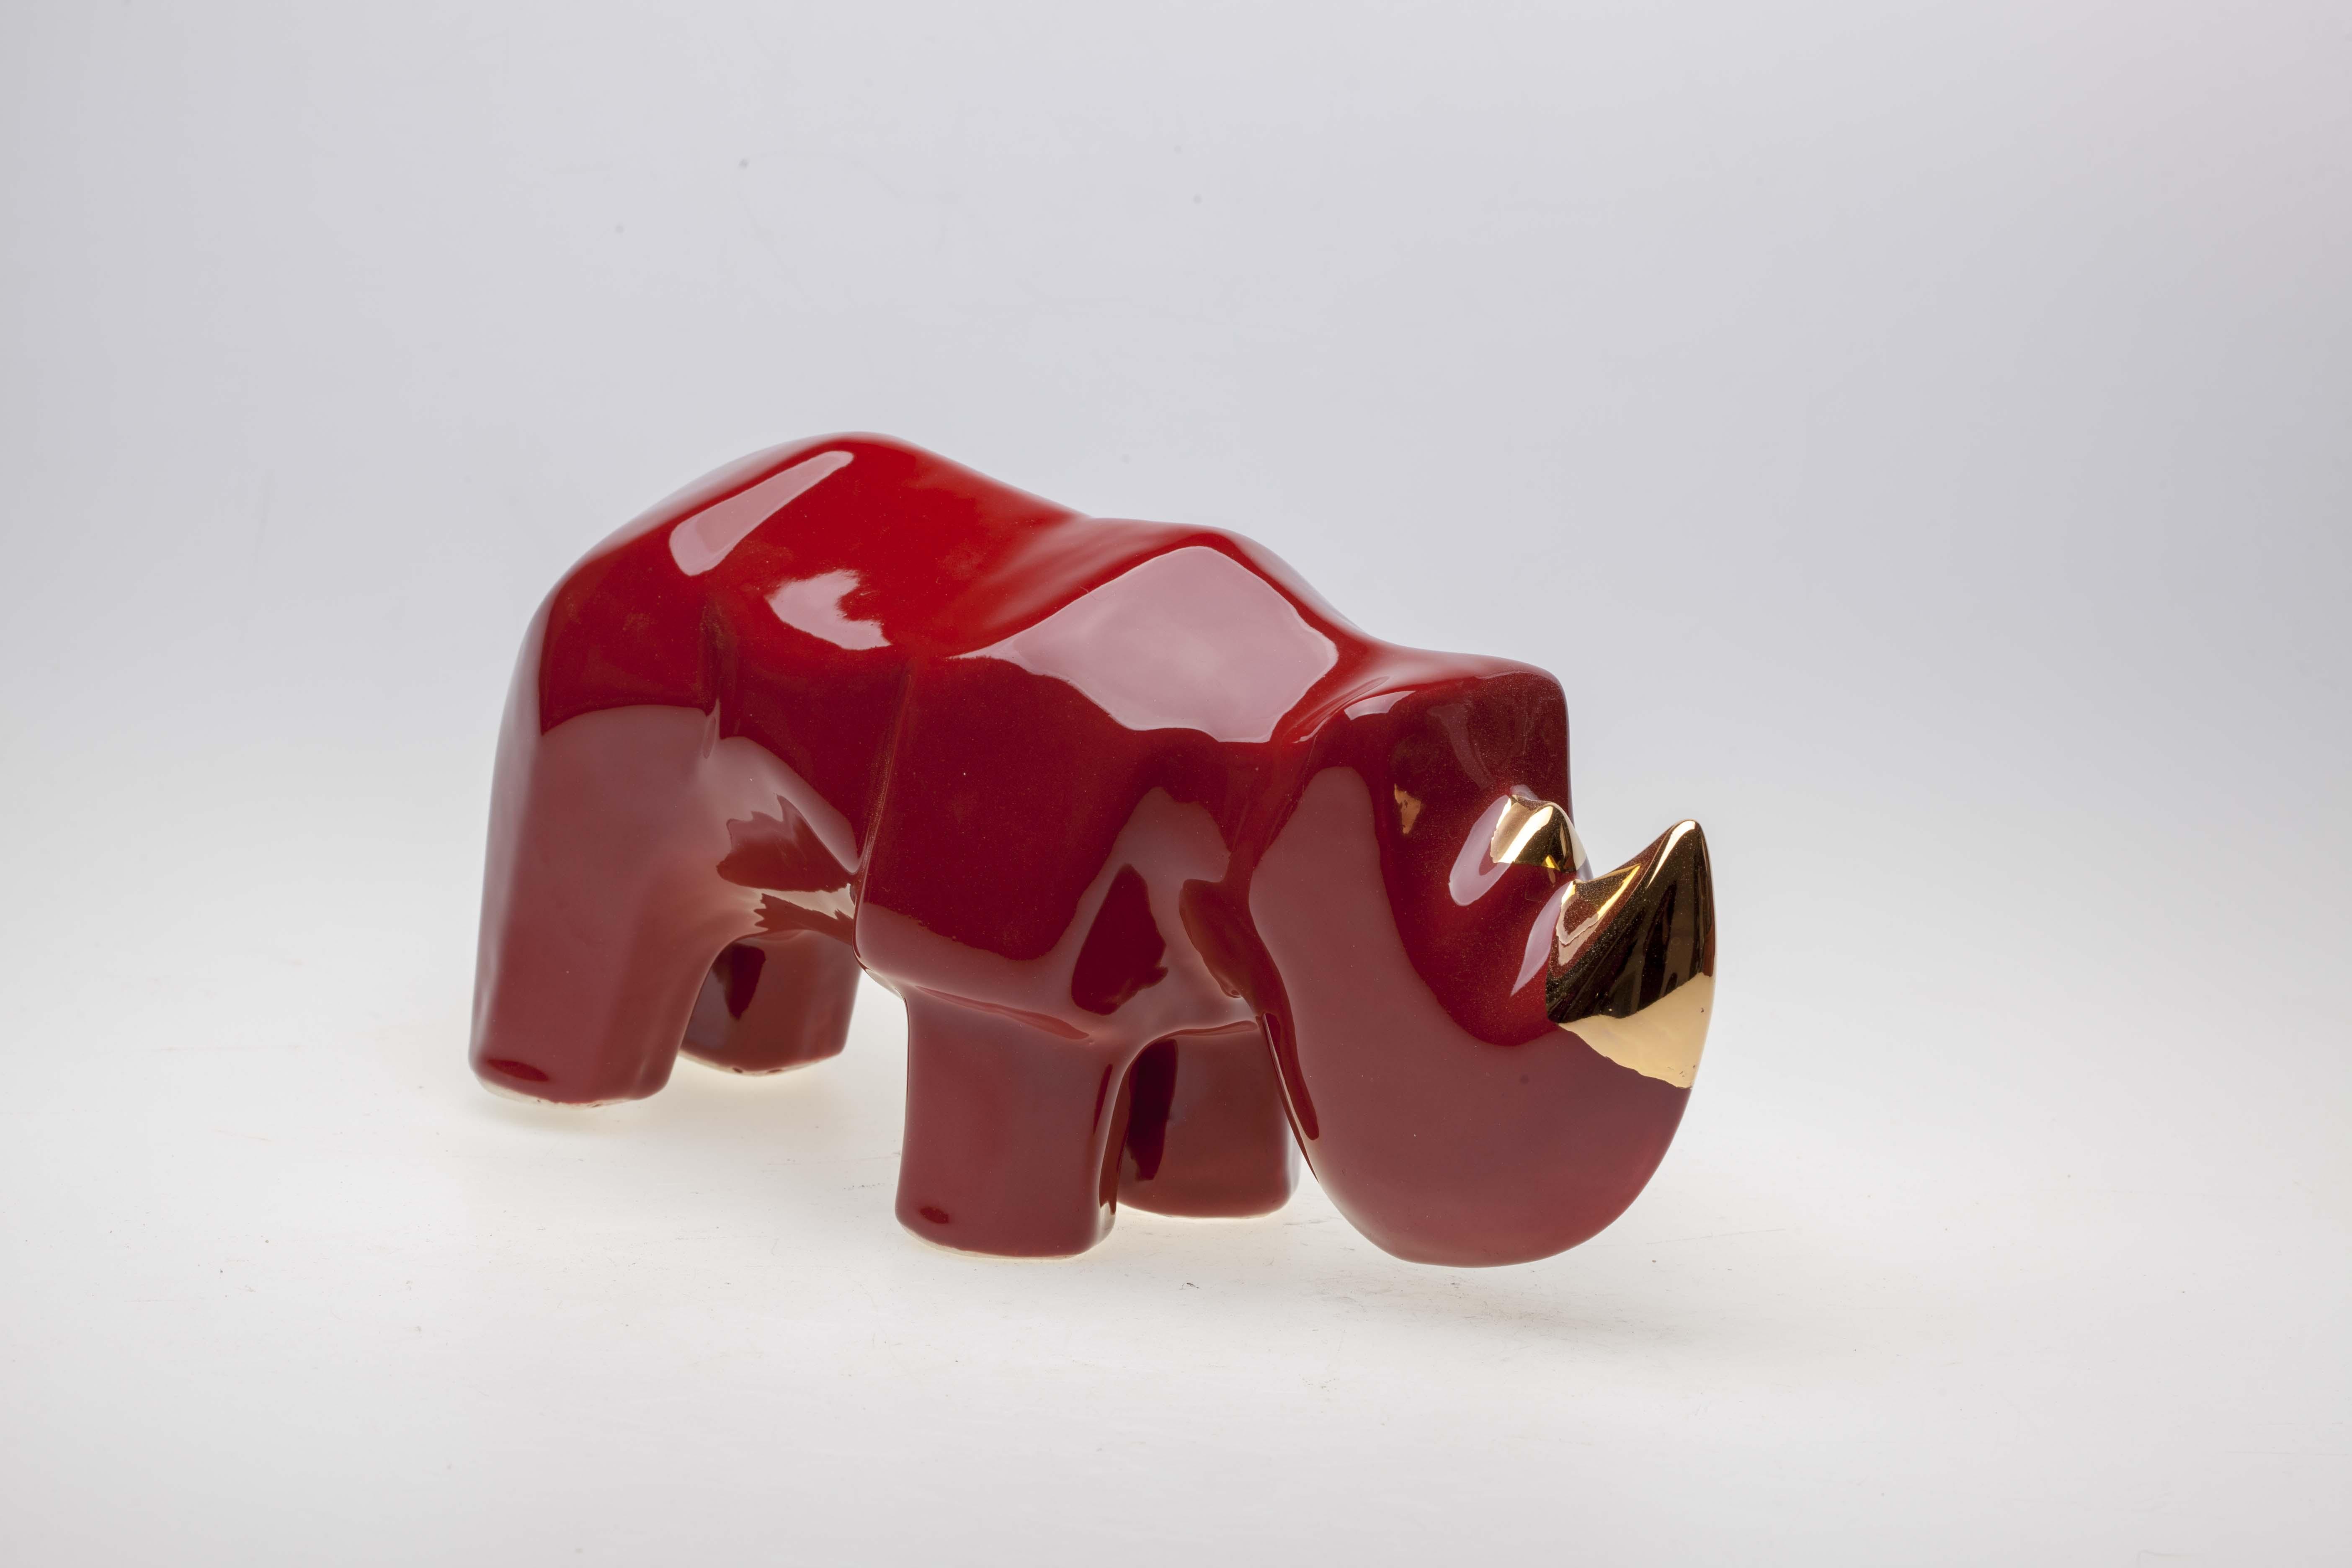 Nosorożec, z serii Safari, 2020